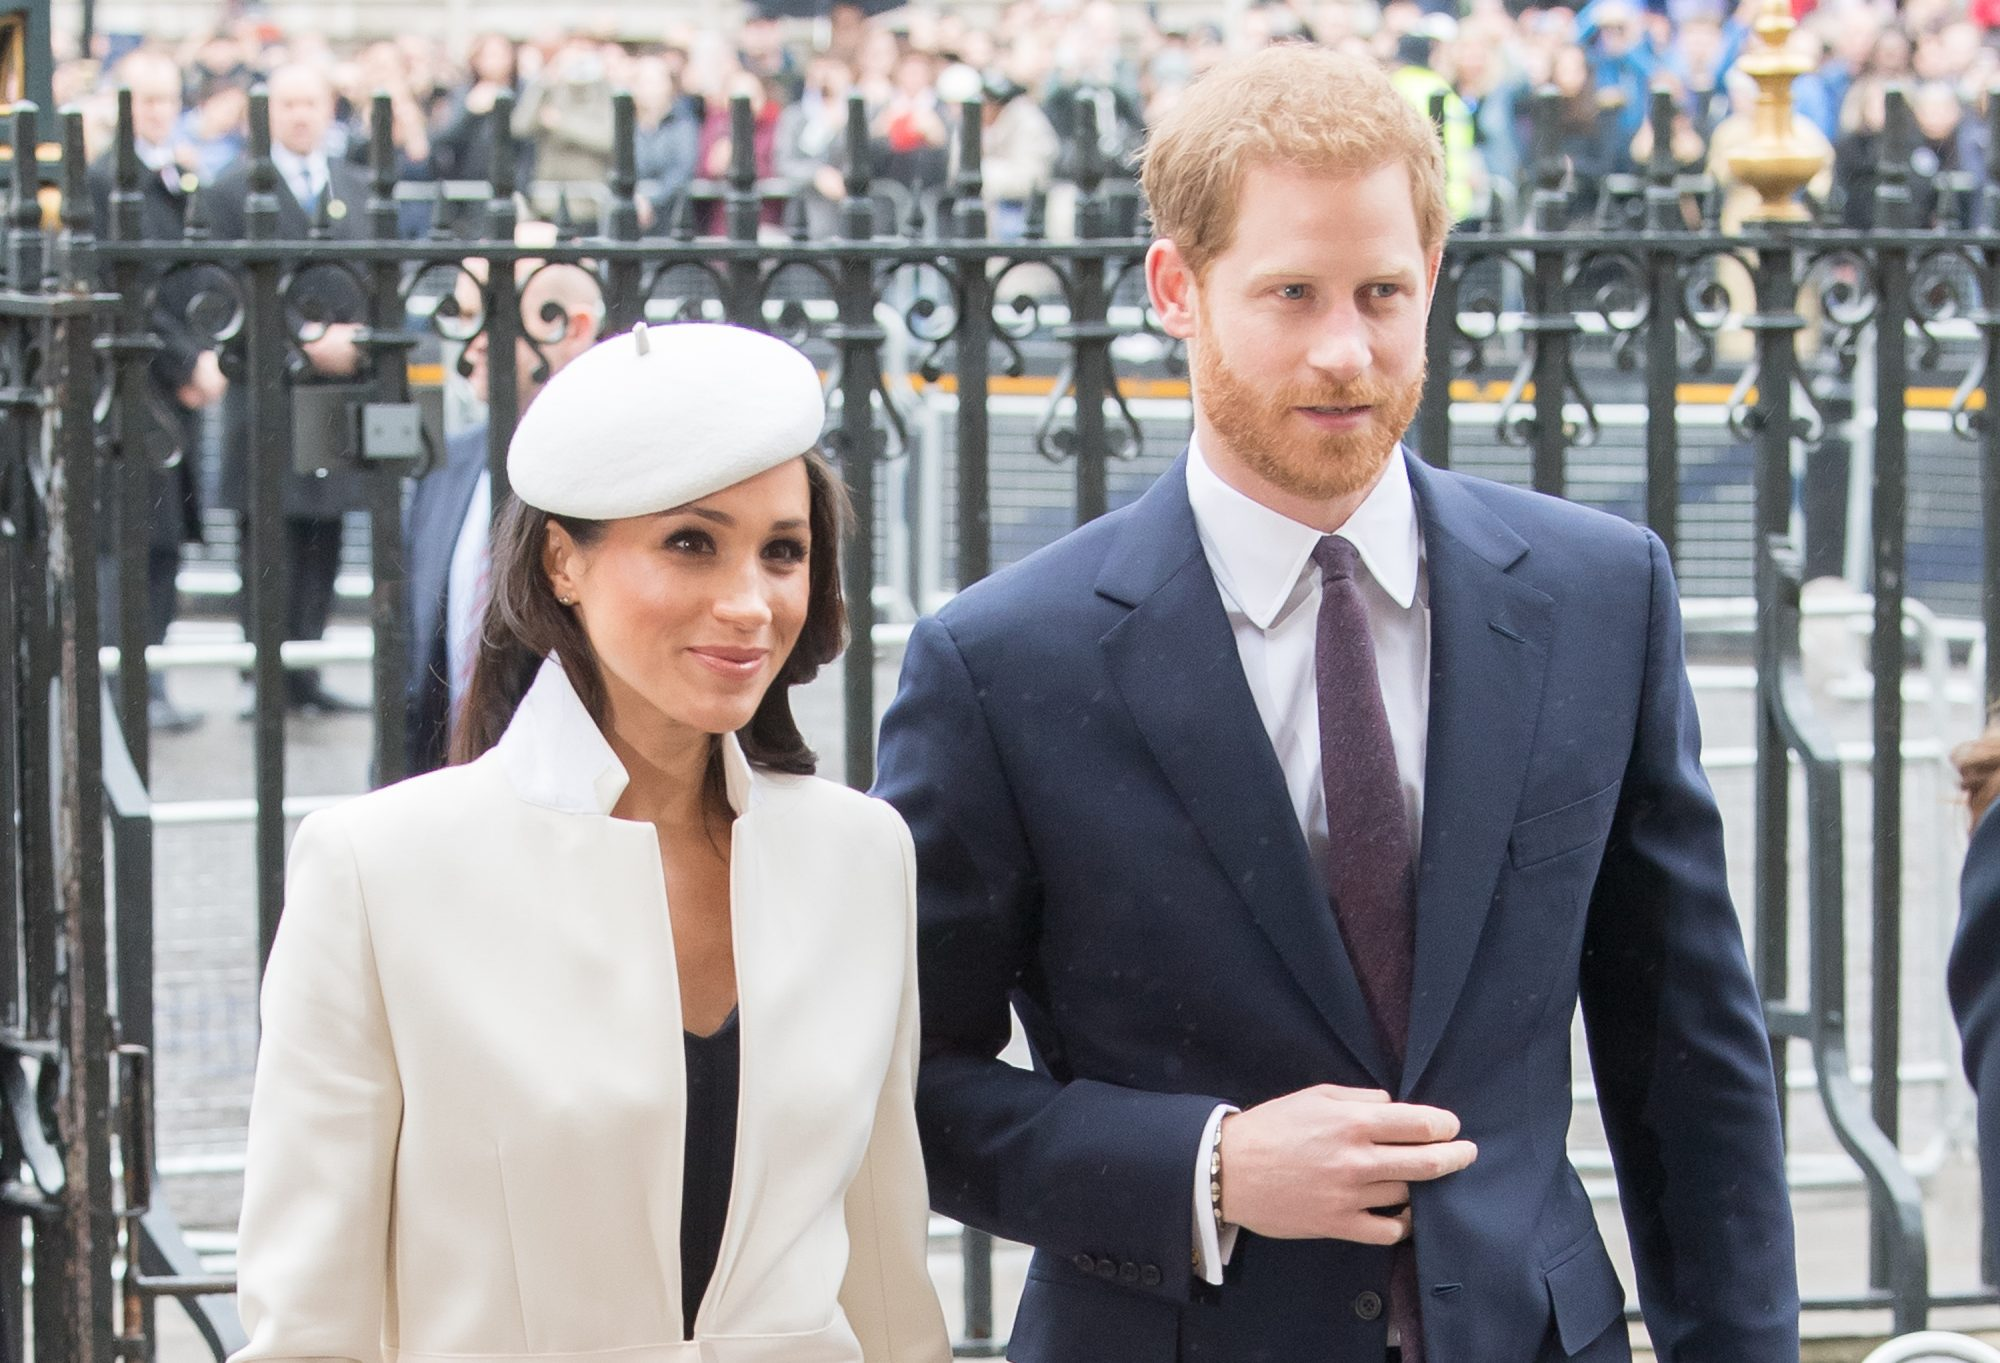 Royal wedding cost OMG